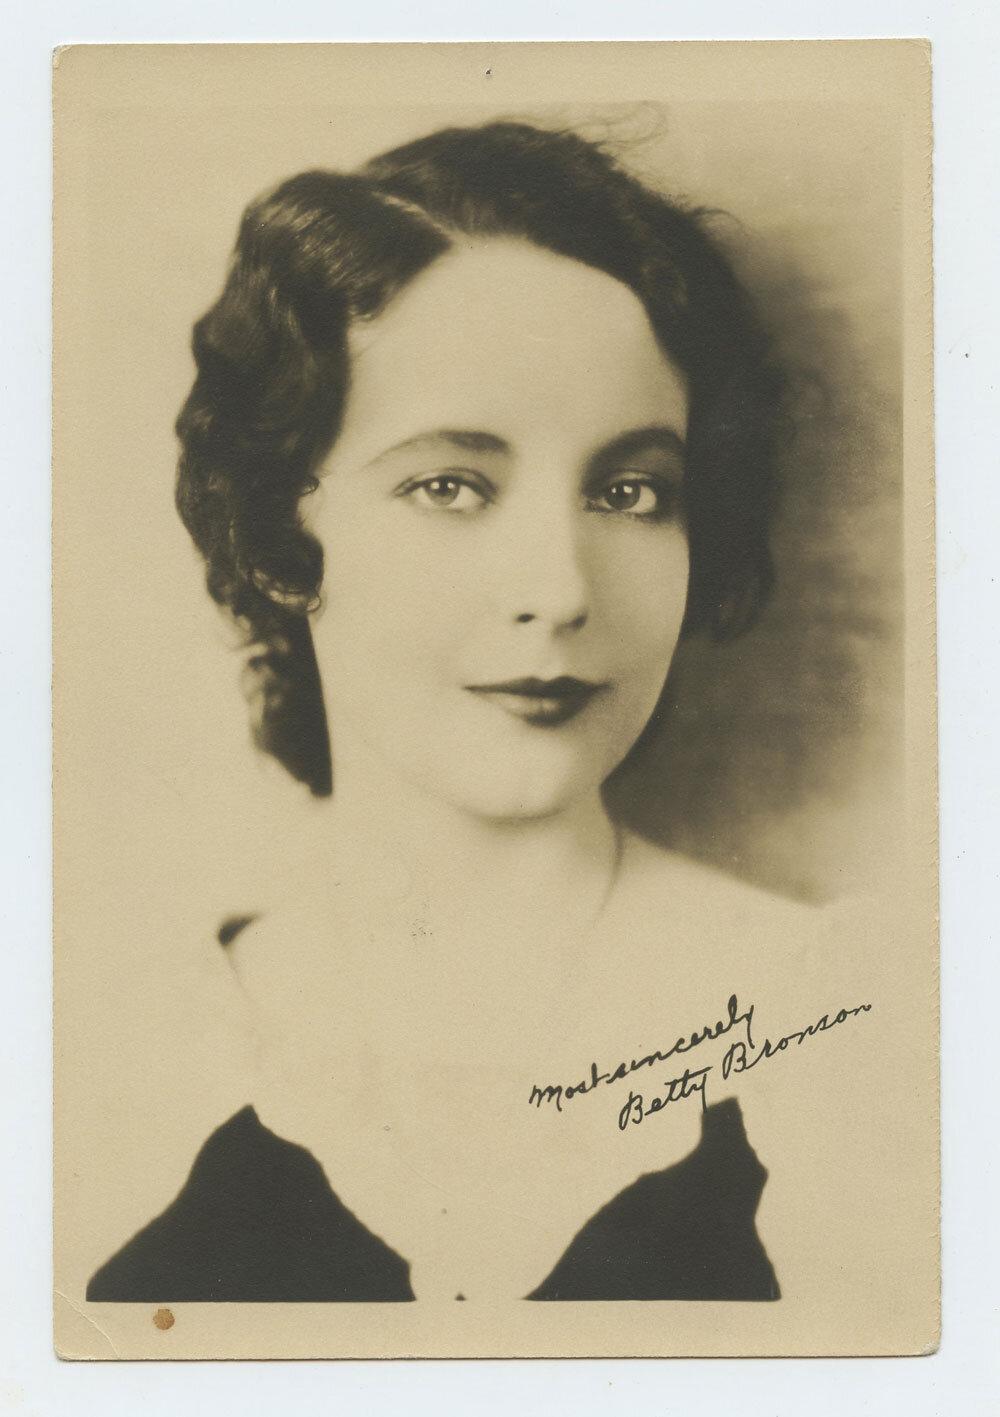 Betty Bronson Photograph 1920s Autographed Inscribed Original Vintage